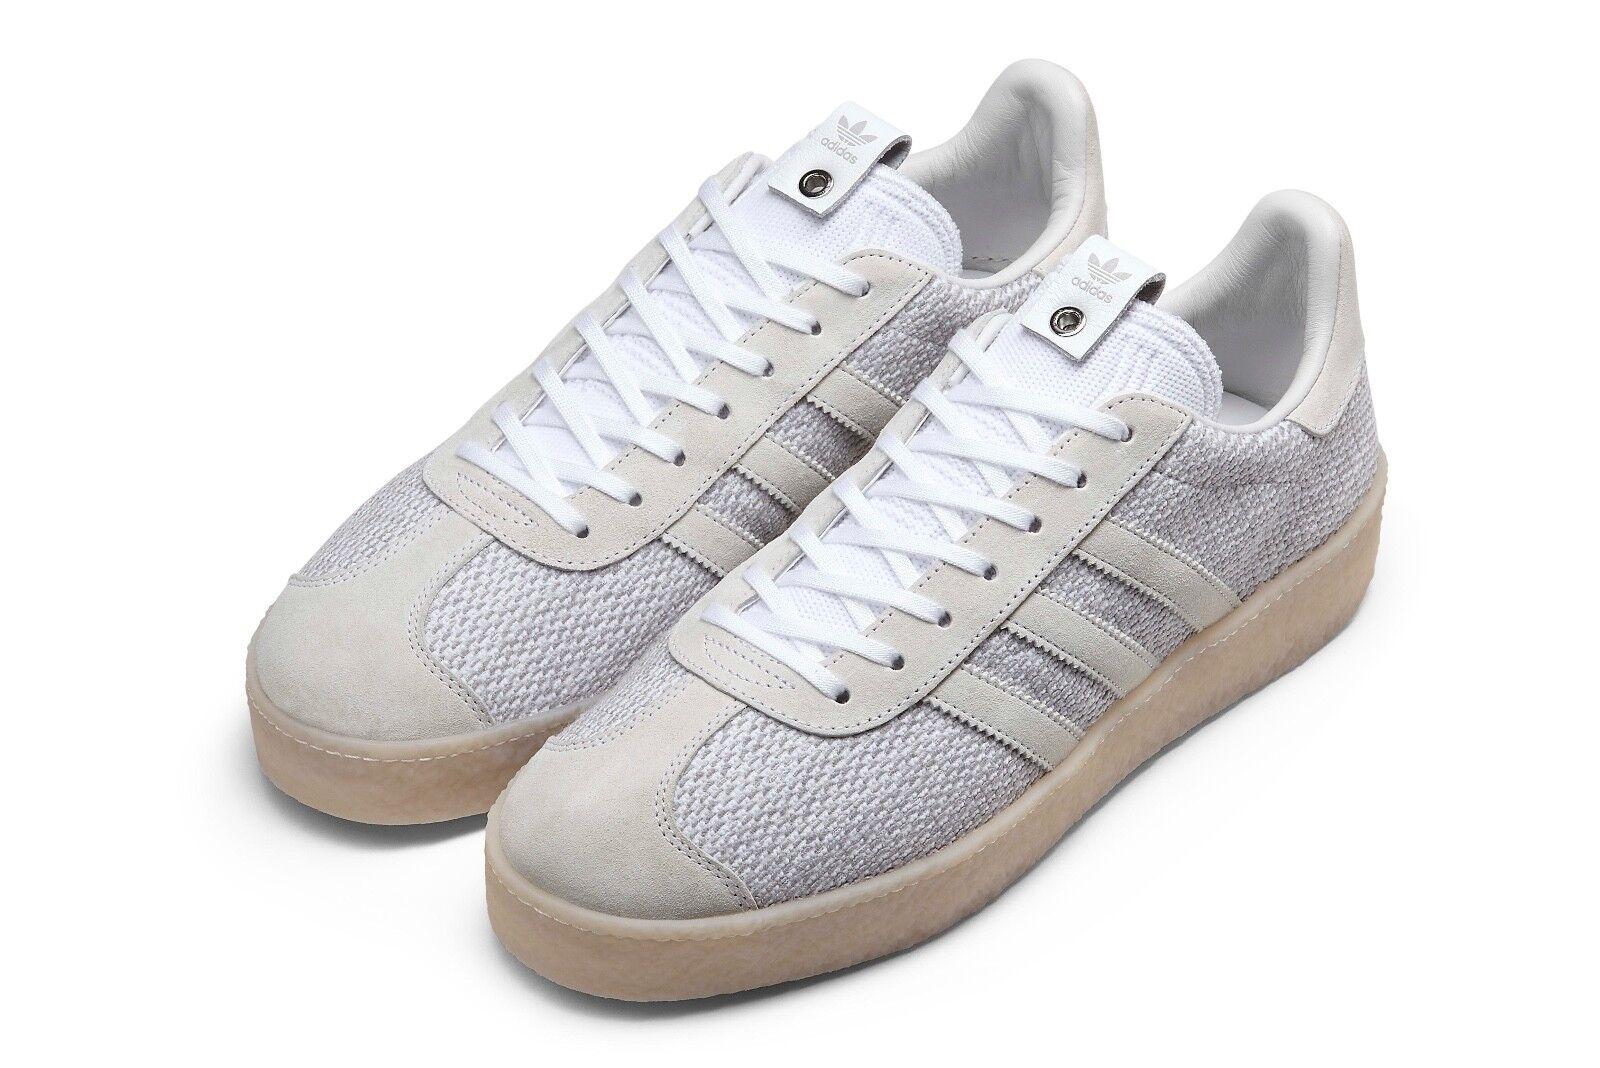 Men's Brand New Adidas Gazelle PK Juice Athletic Fashion Sneakers